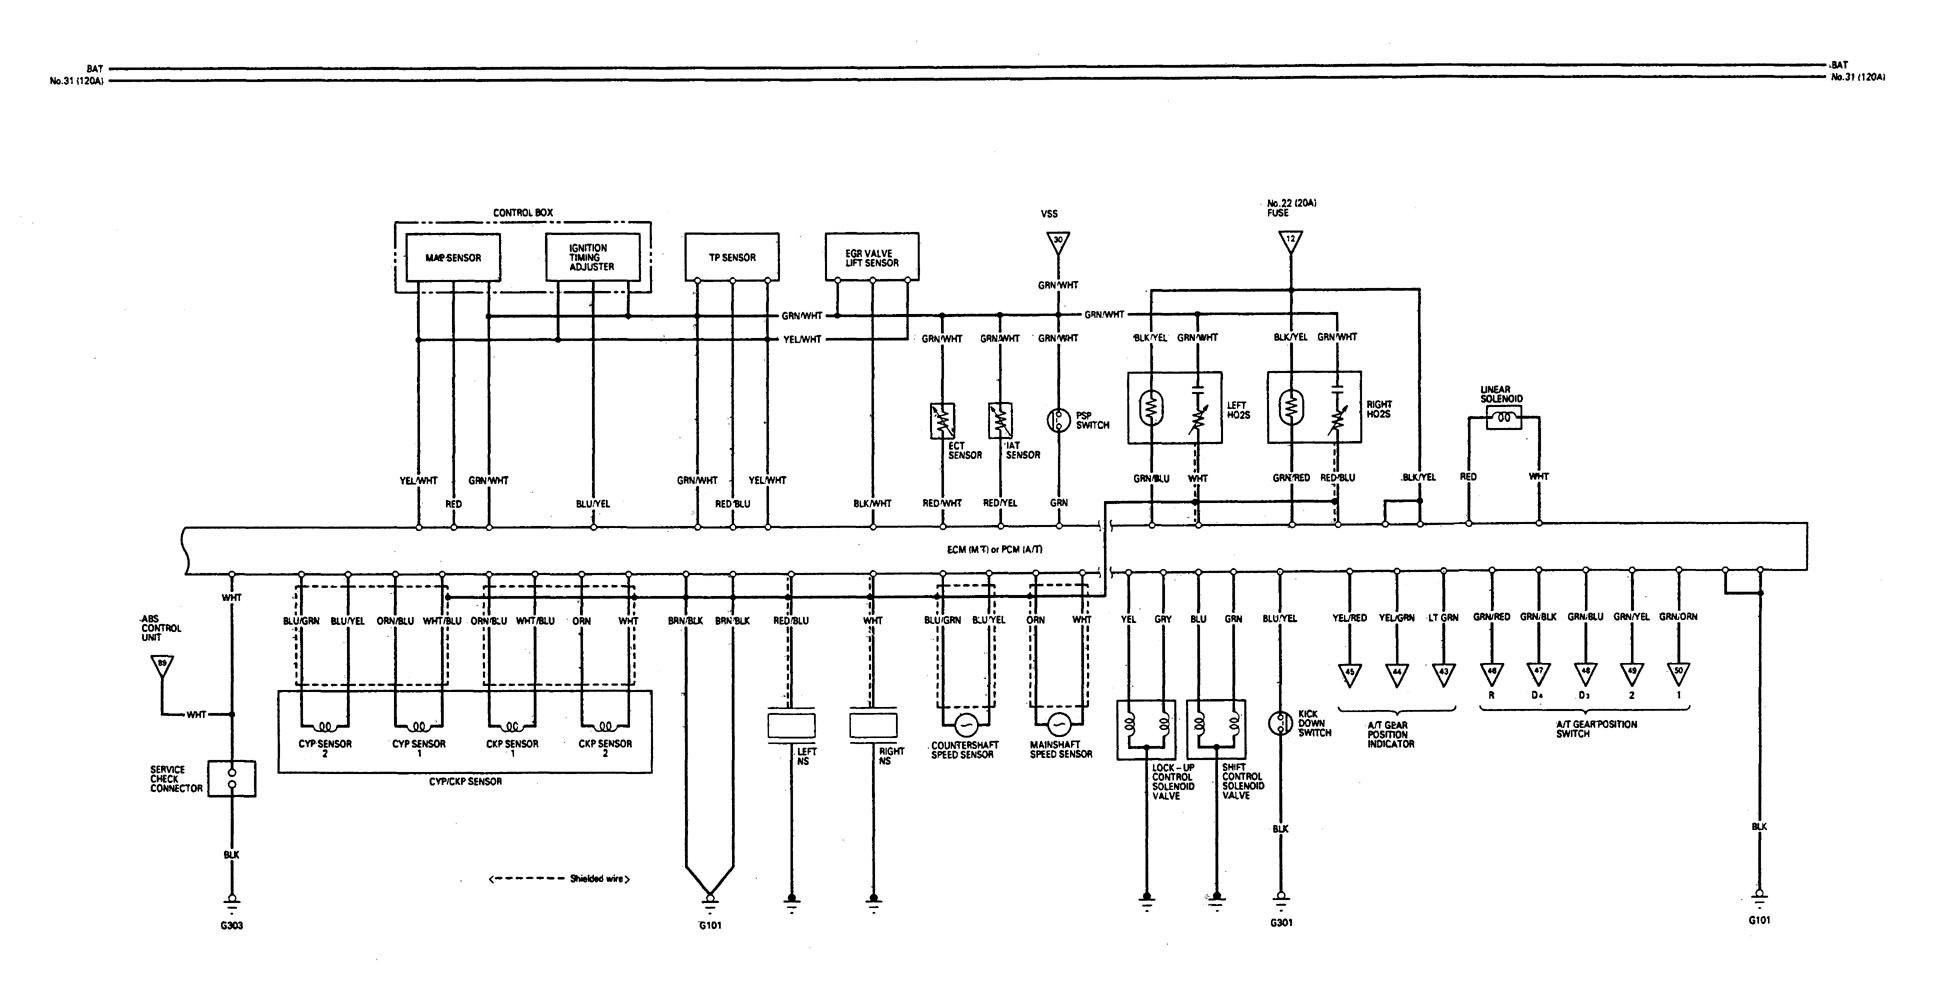 acura legend  1993  - wiring diagram - fuel control